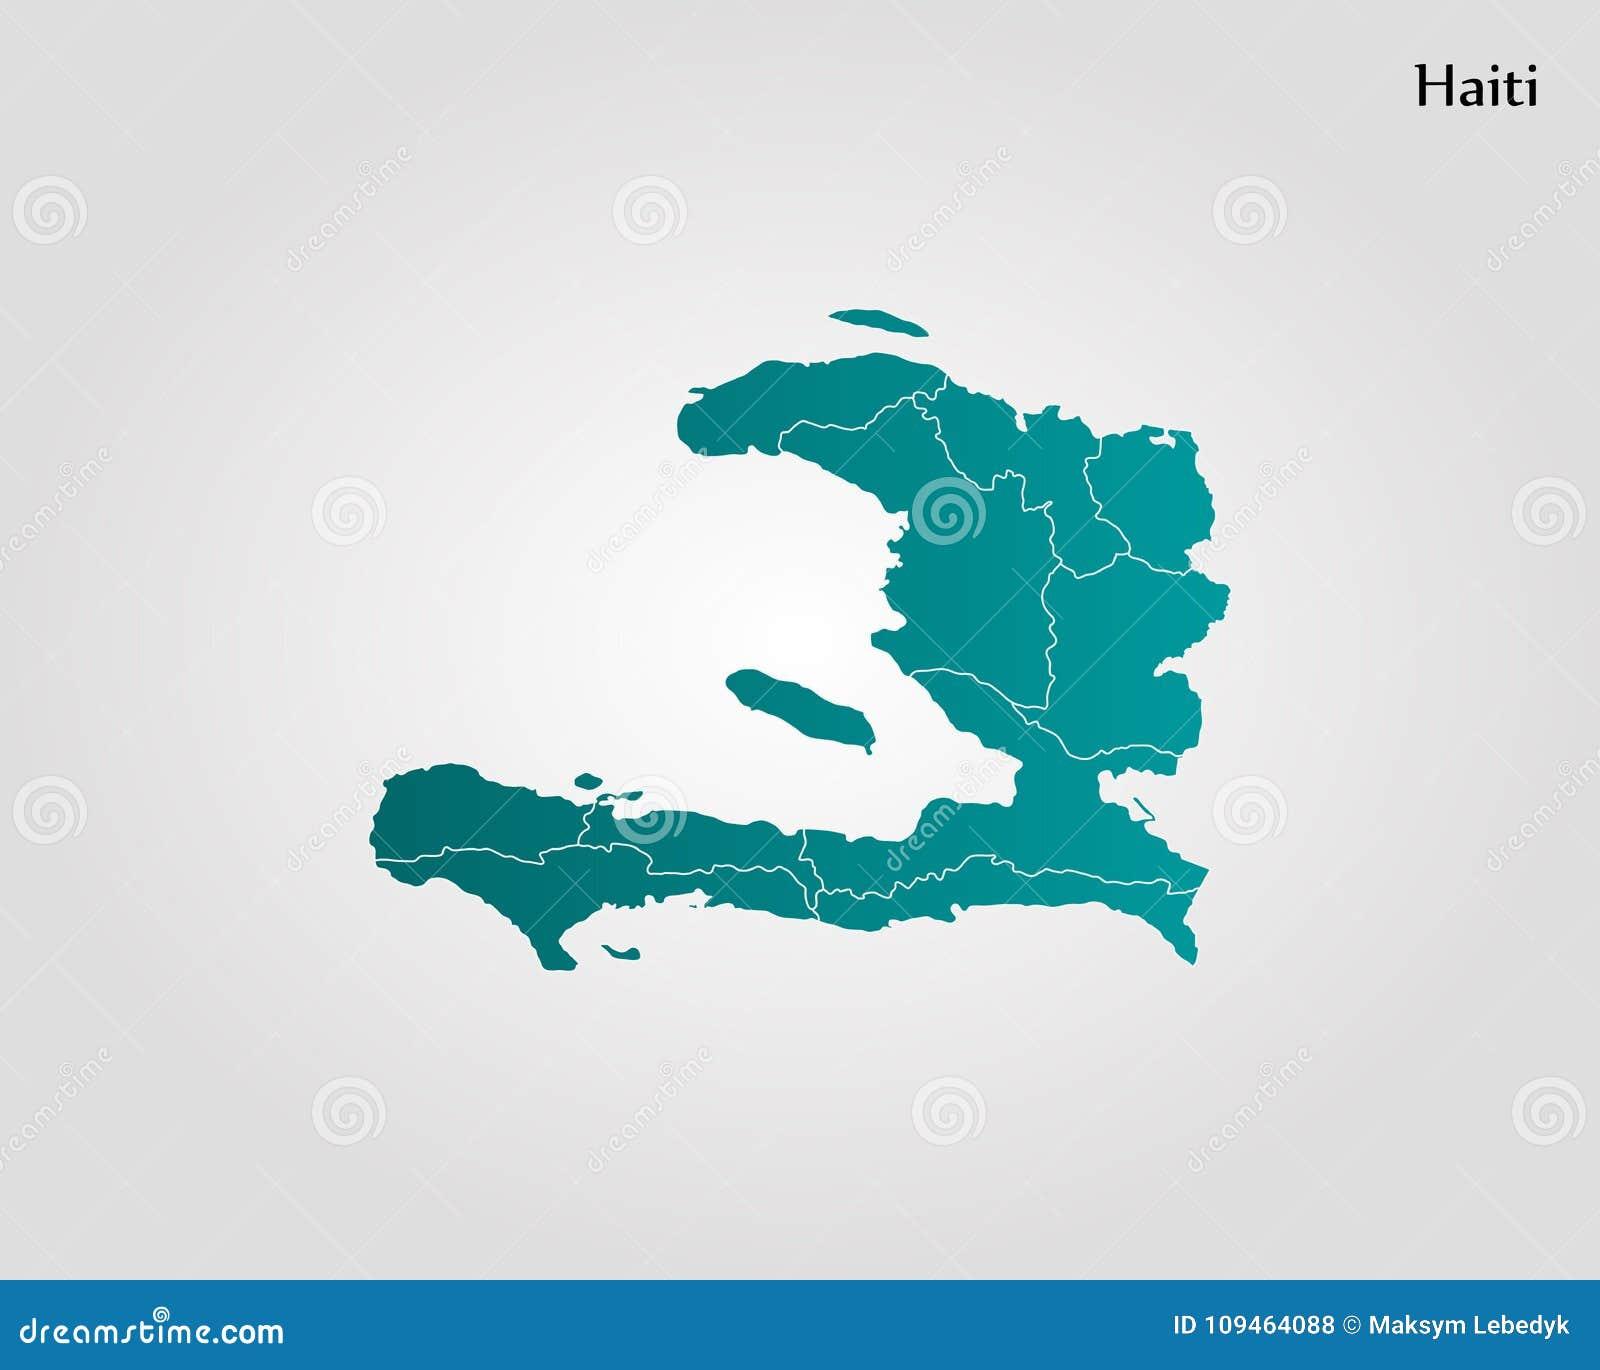 Map of haiti stock illustration illustration of clip 109464088 download map of haiti stock illustration illustration of clip 109464088 gumiabroncs Images